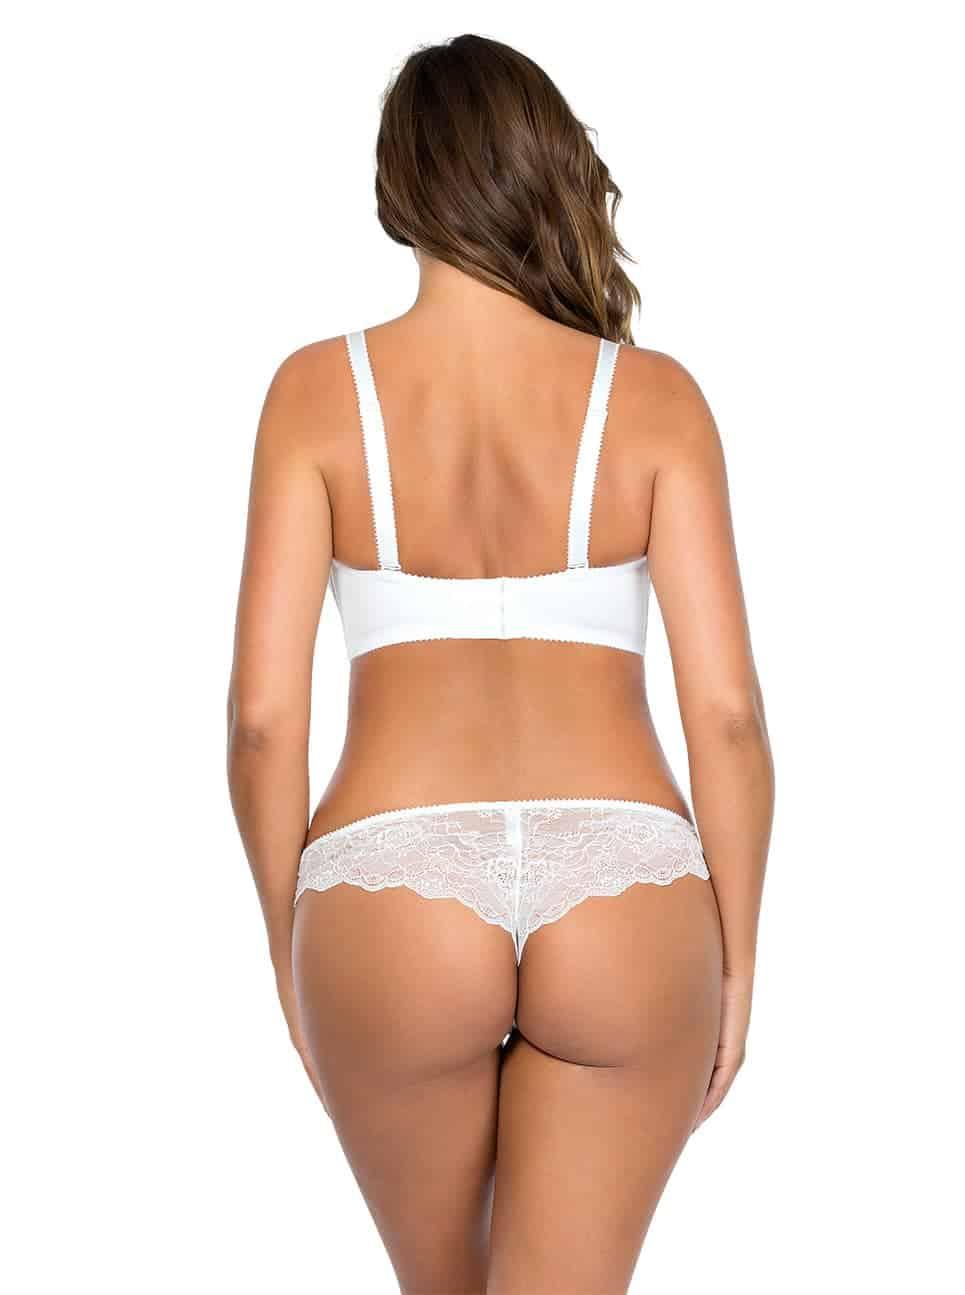 Elissa StraplessBraP5011 BrazilianThongP5014 PearlWhite Back - Elissa Strapless Bra - Pearl White - P5011